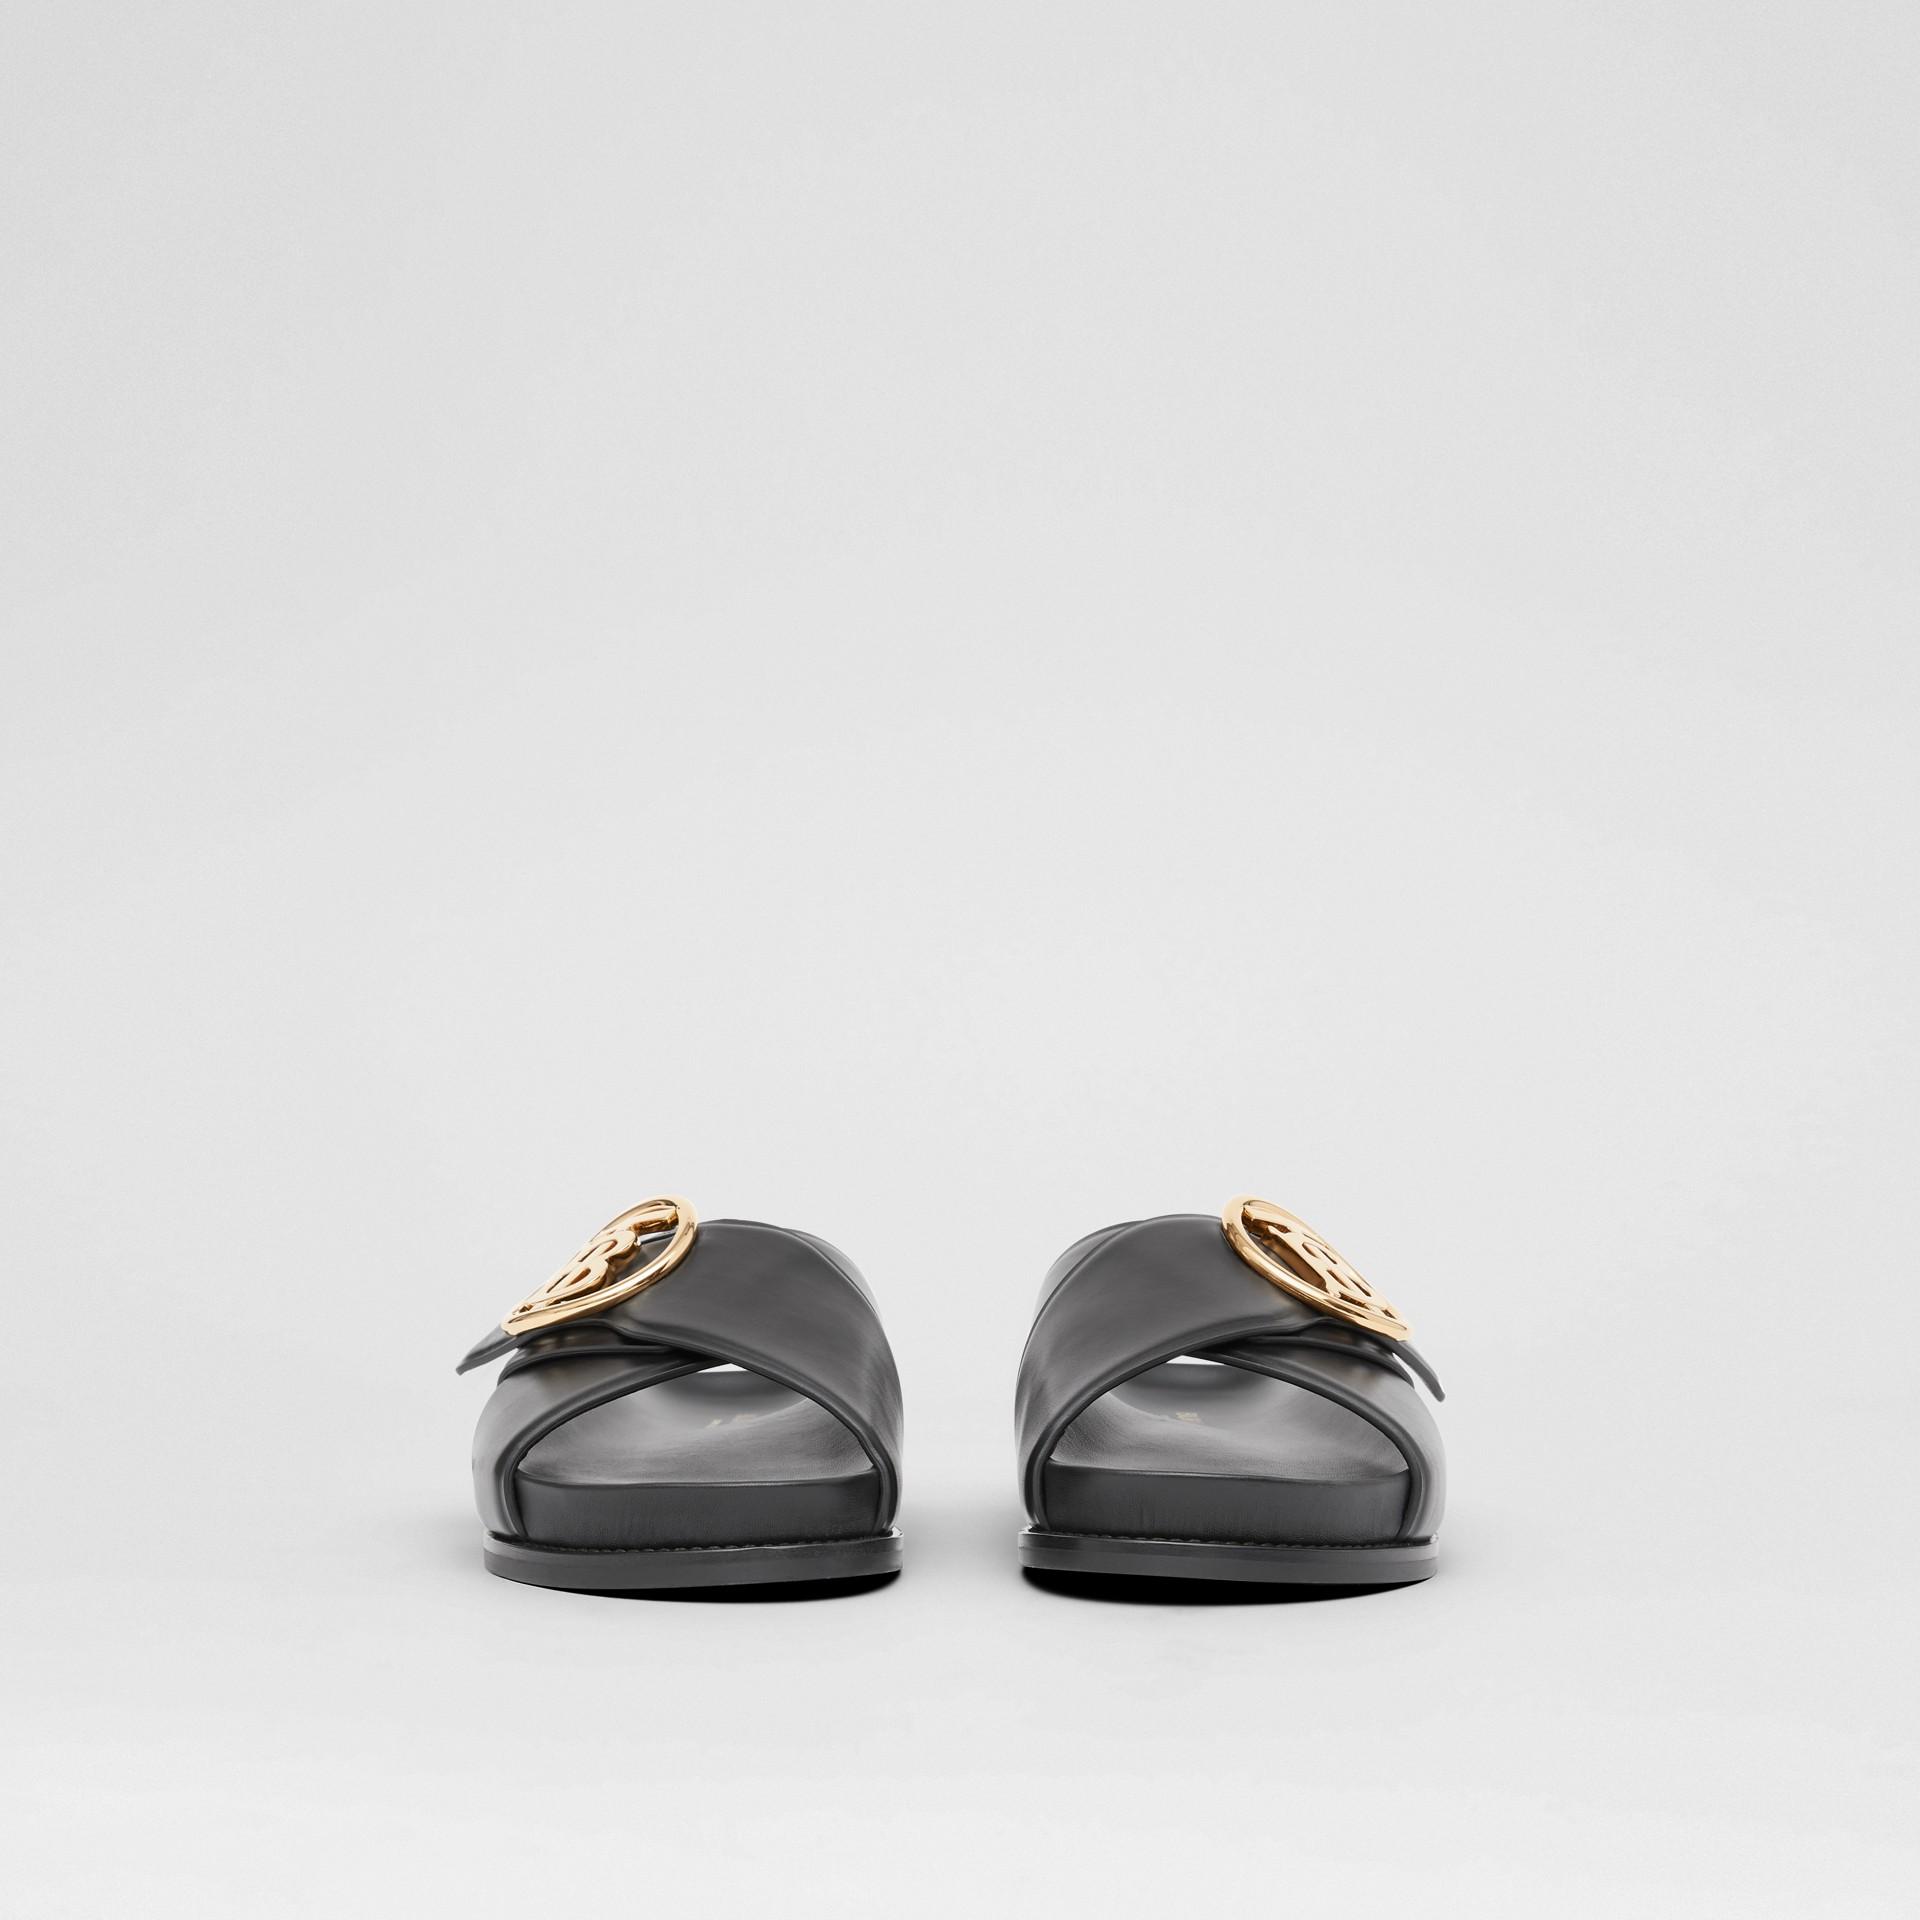 Monogram Motif Leather Slides in Black - Women | Burberry - gallery image 3